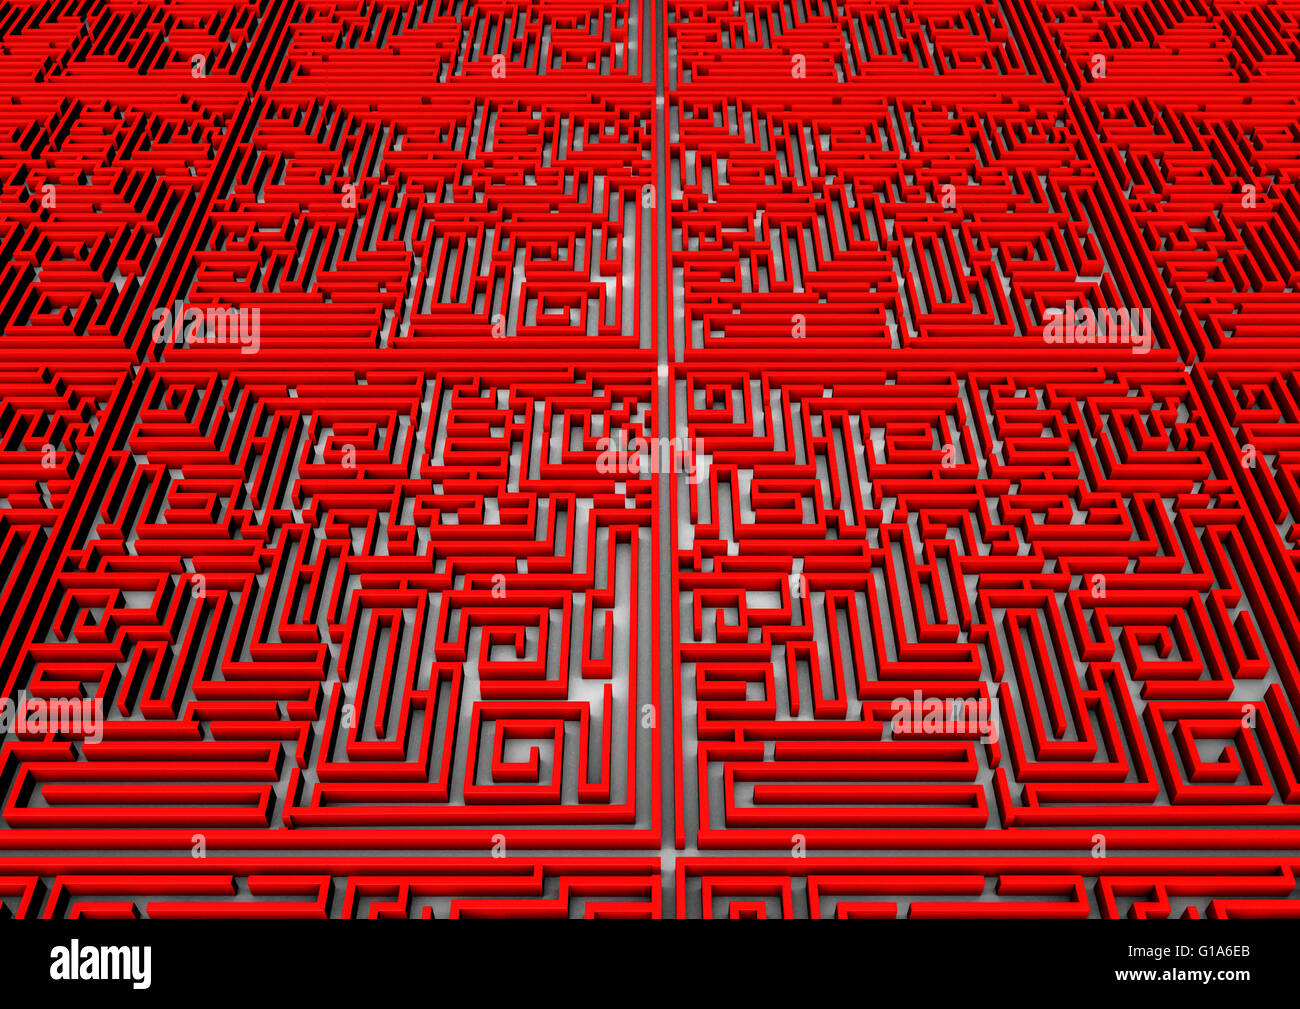 Antecedentes Laberinto / 3D Render de laberinto gigante estirando a horizonte Imagen De Stock